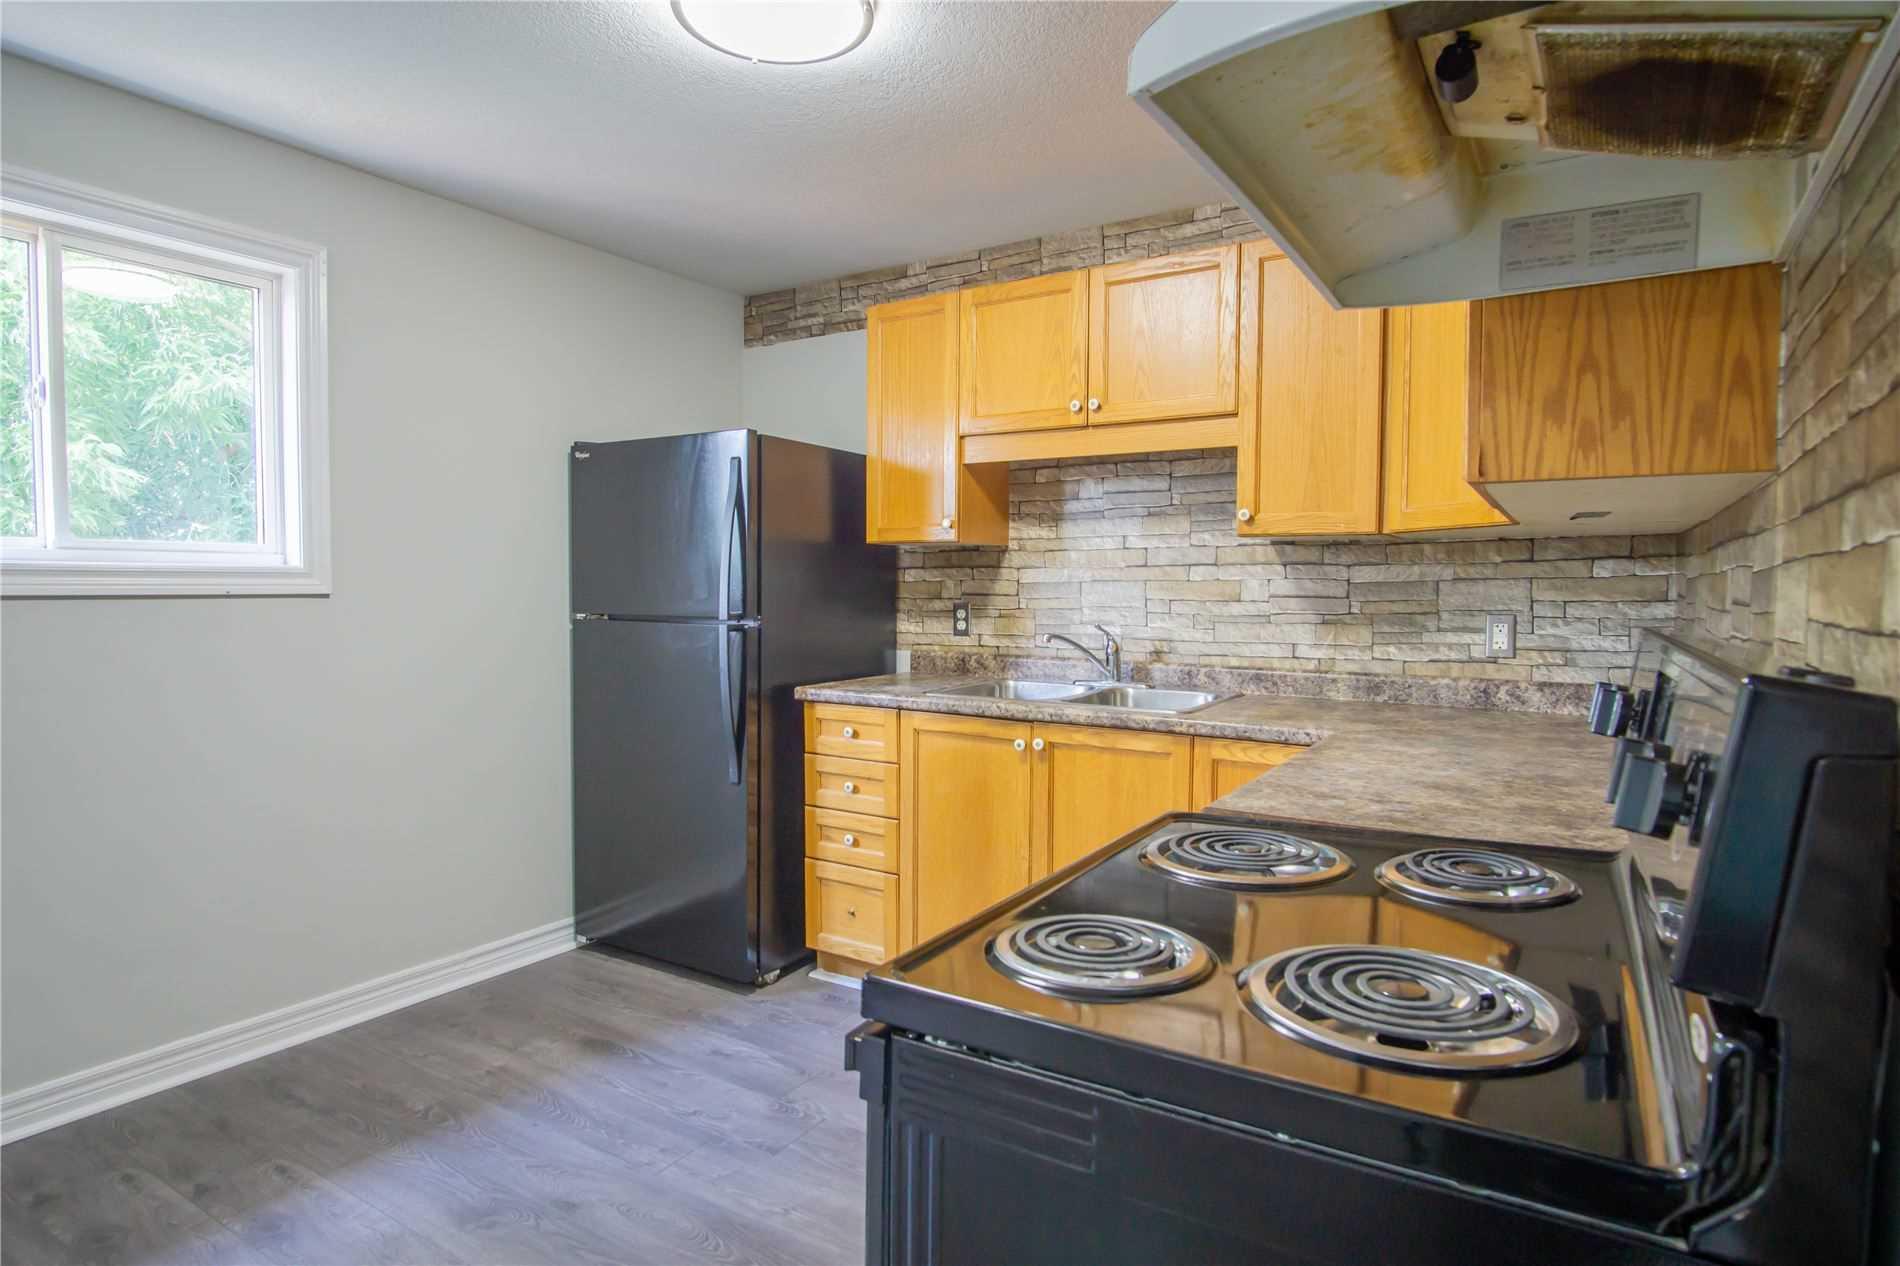 297 Greenwich Street St, Brantford, Ontario N3S2X9, 3 Bedrooms Bedrooms, 8 Rooms Rooms,2 BathroomsBathrooms,Detached,For Sale,Greenwich Street,X5349600